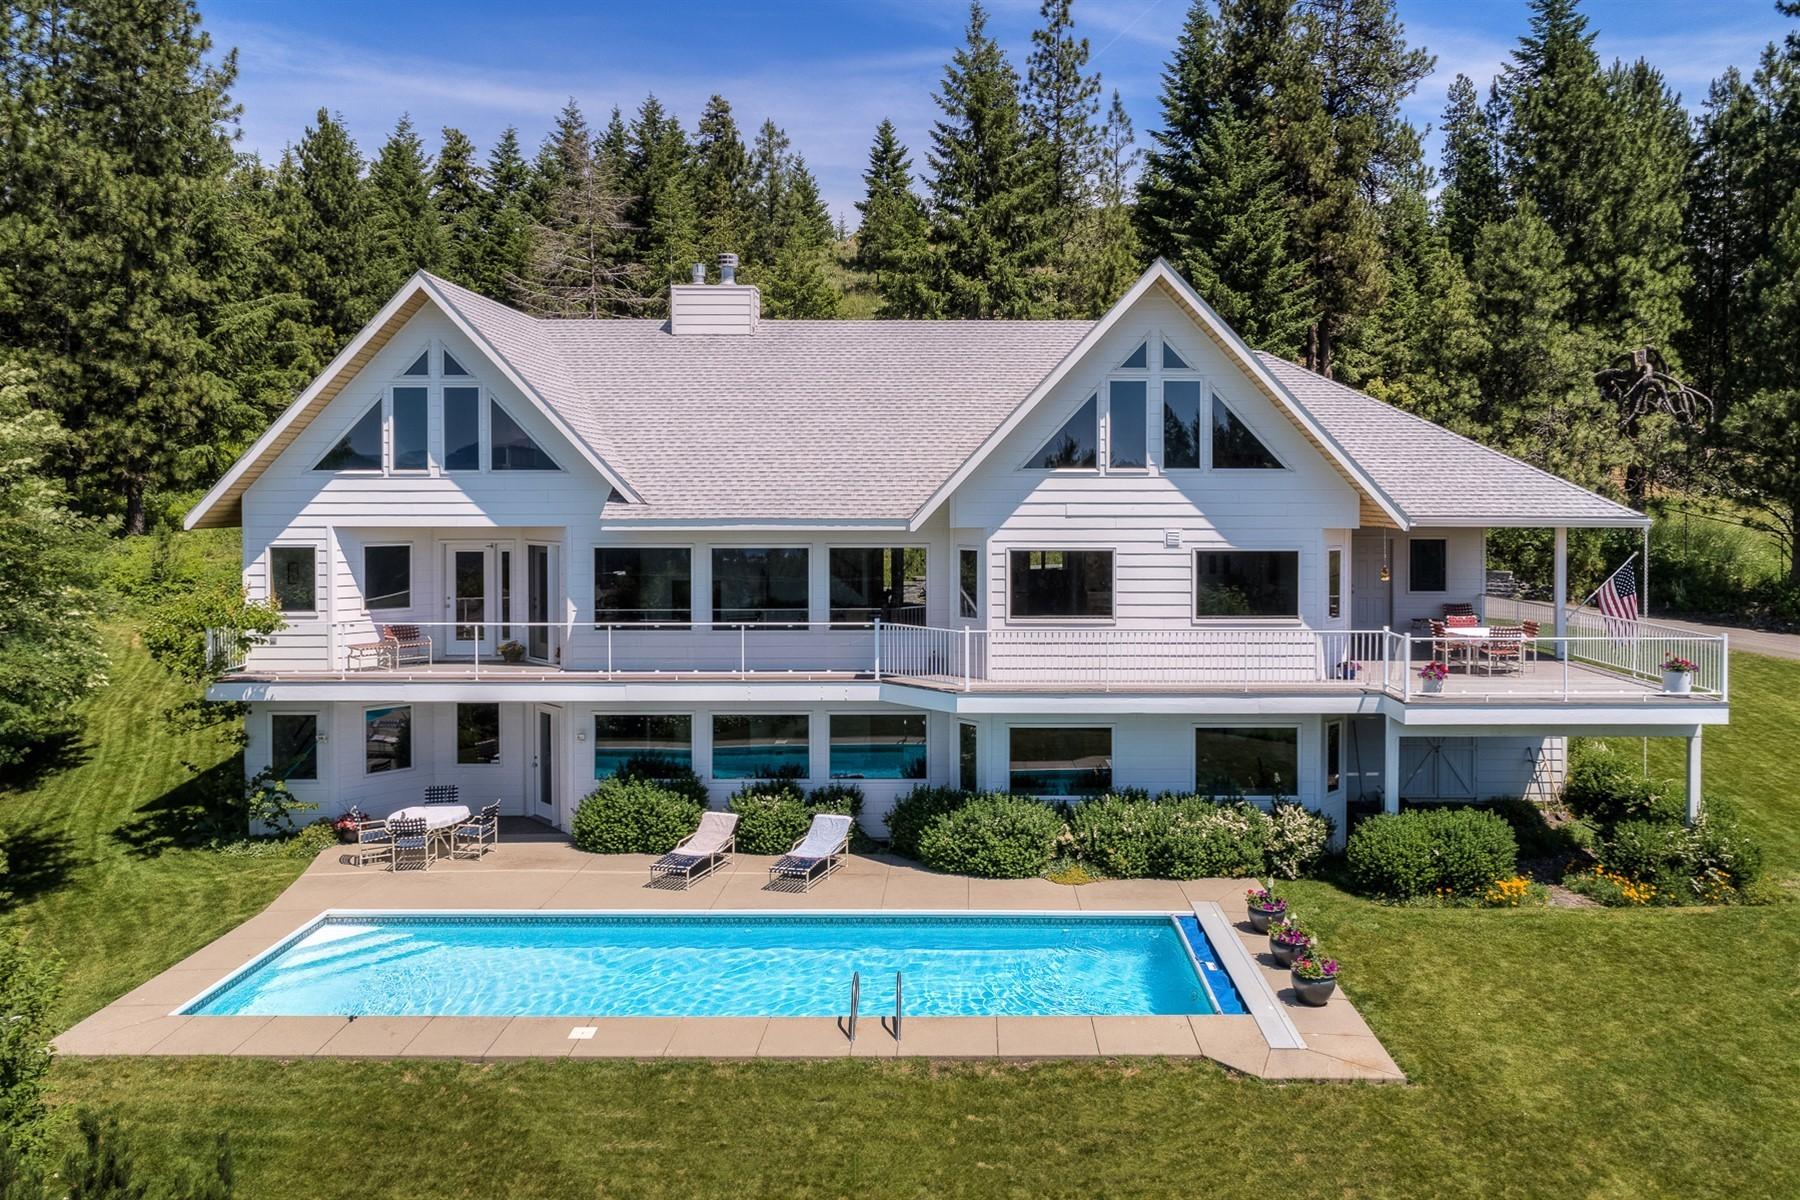 Single Family Homes for Sale at 3373 E. Fernan Hill Road Coeur D Alene, Idaho 83814 United States